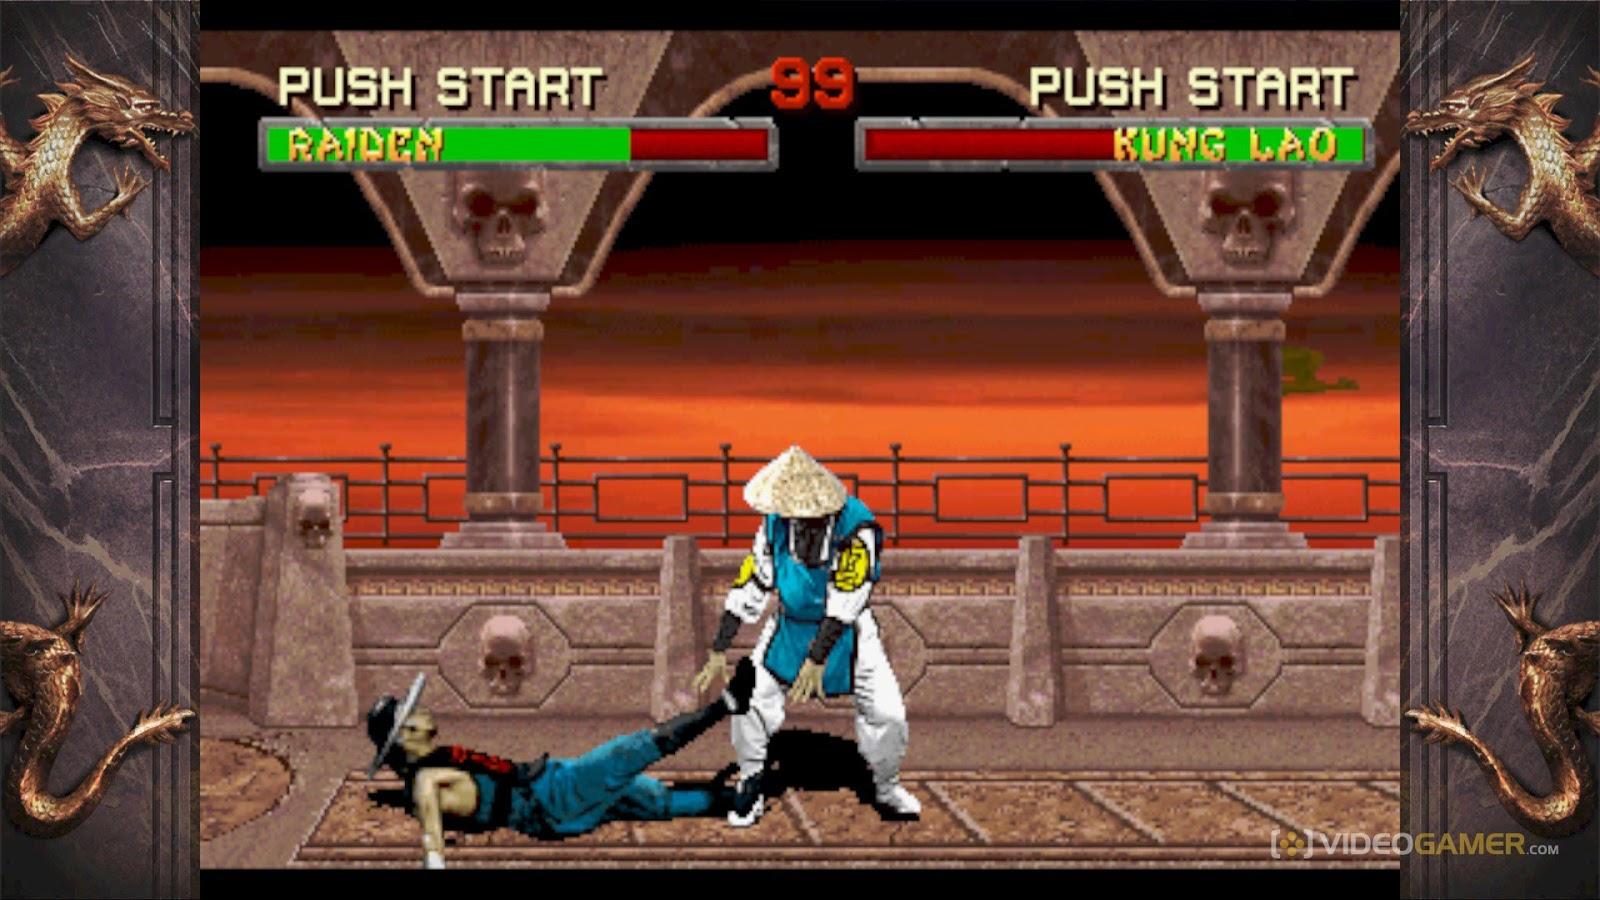 Mortal kombat arcade kollection pc download | Mortal Kombat